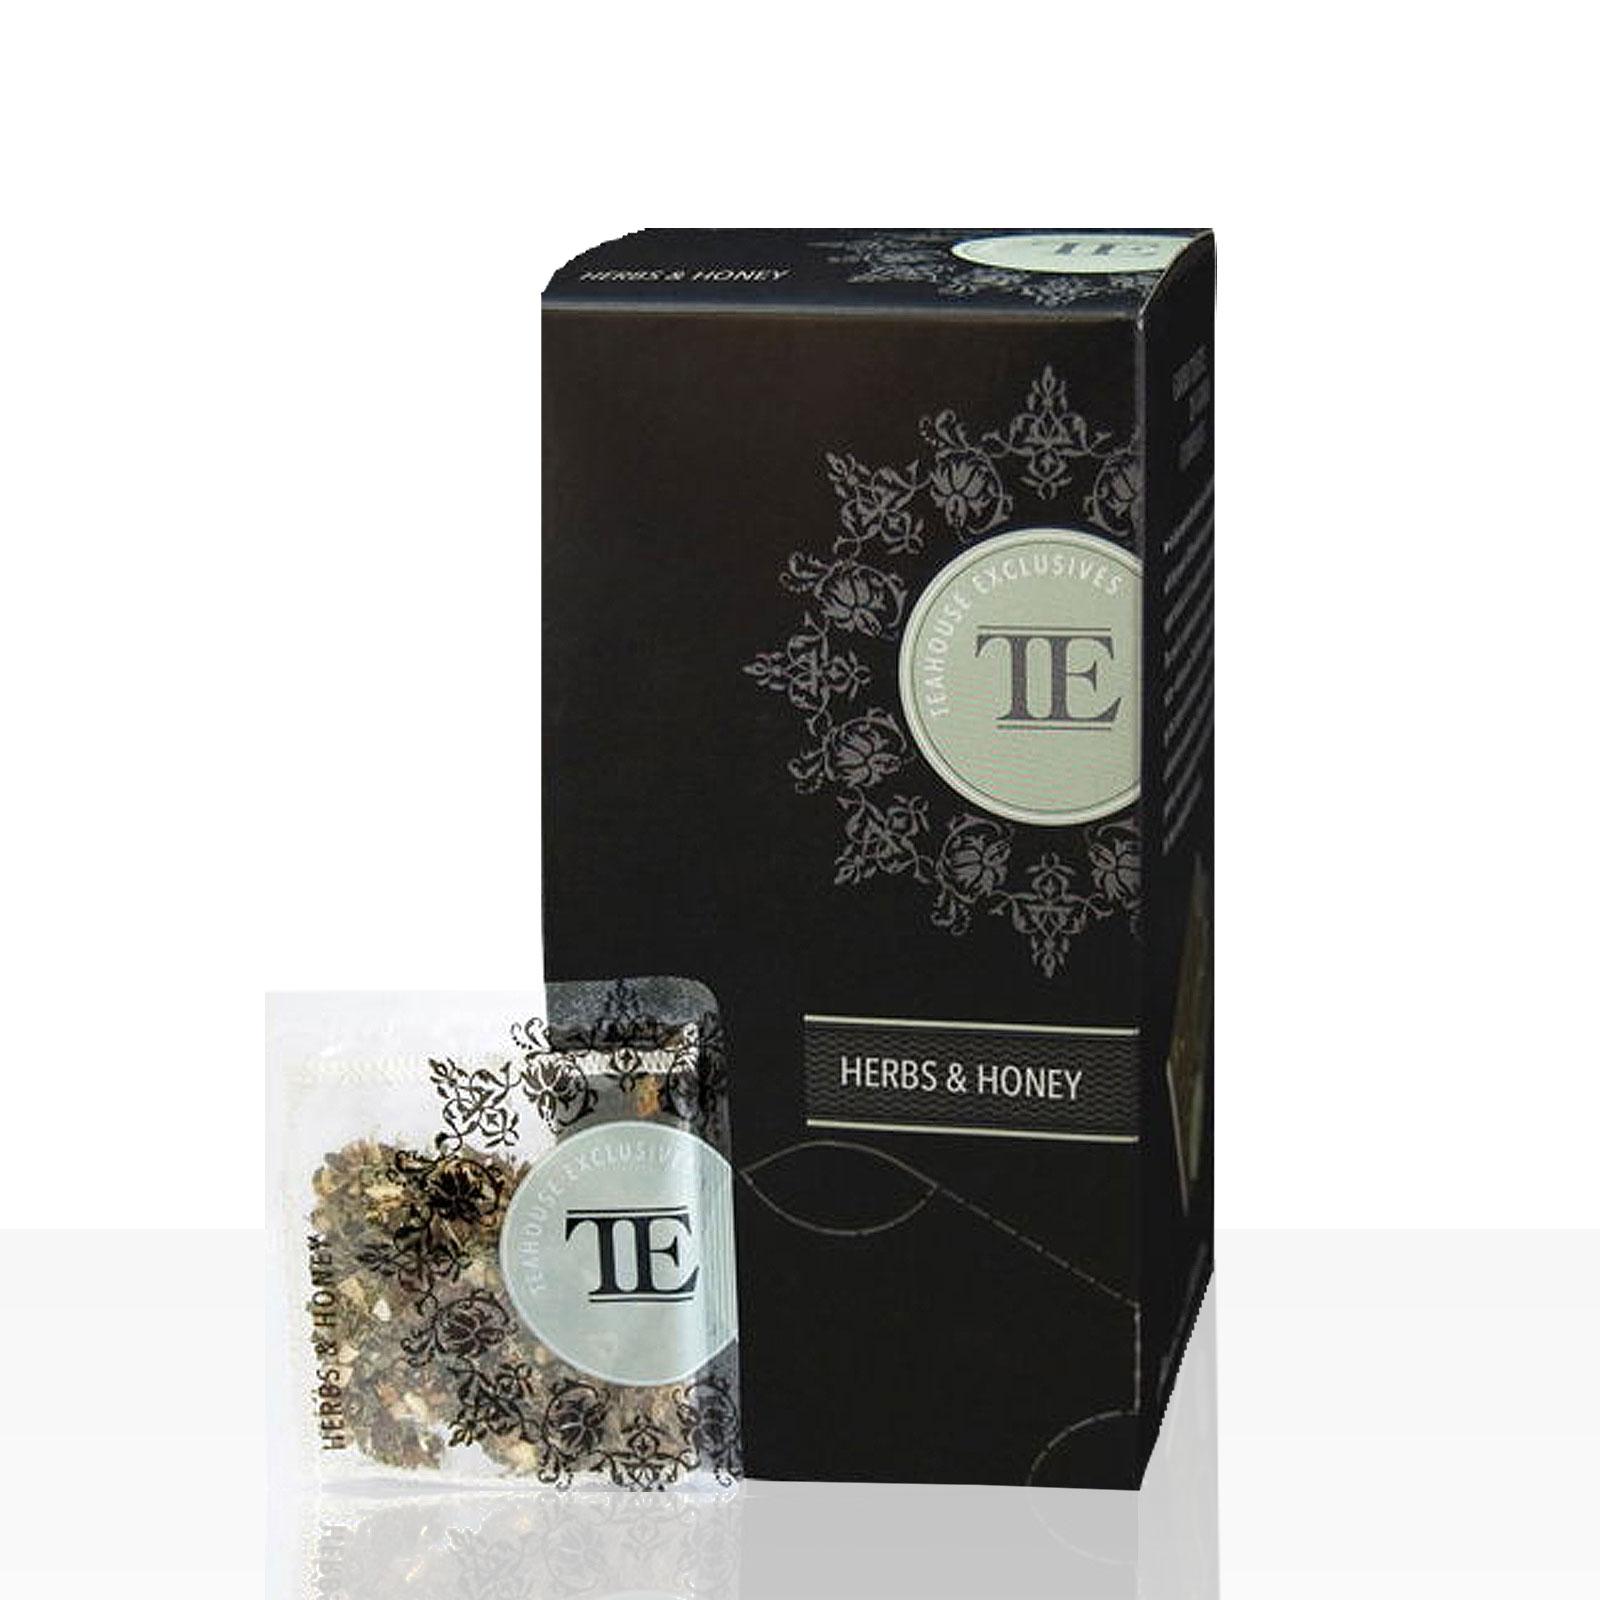 TE Luxury Teahouse Exclusives Herbs & Honey, Kräuter & Honig 6 x 15 Beutel á 3,5g